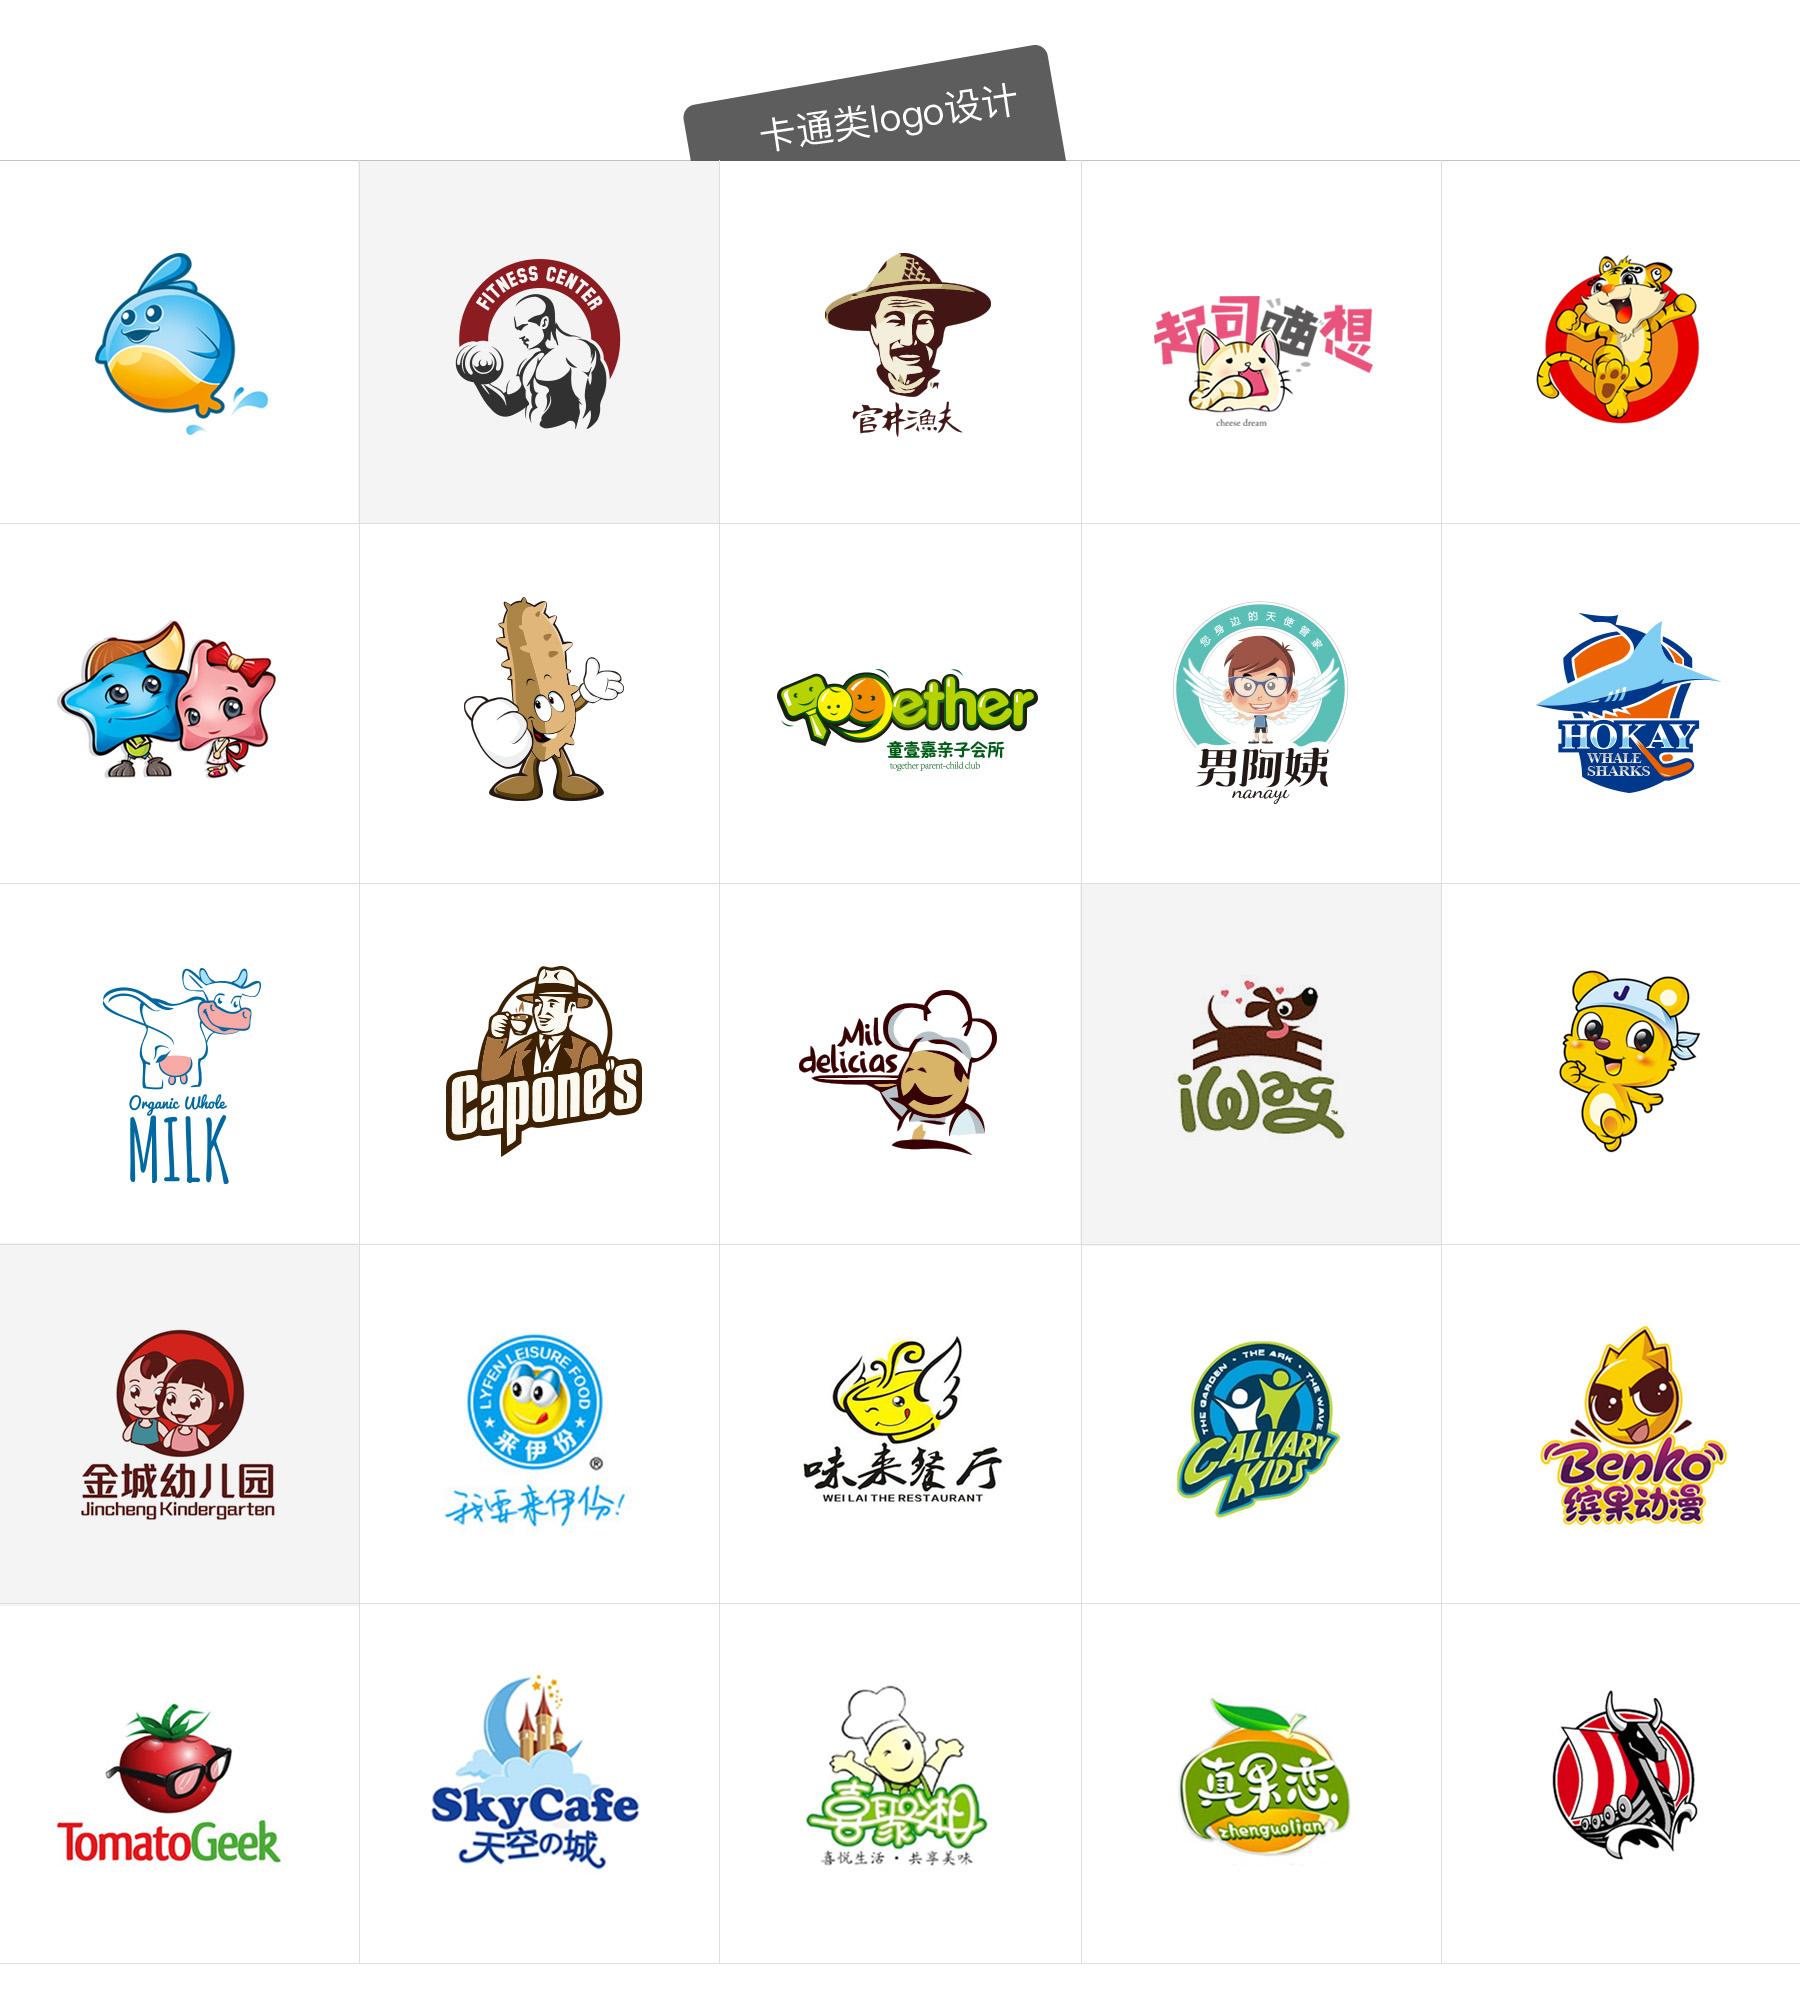 LOGO_logo公司餐饮网站品牌酒店教育卡通图标标志商标LOGO设计8